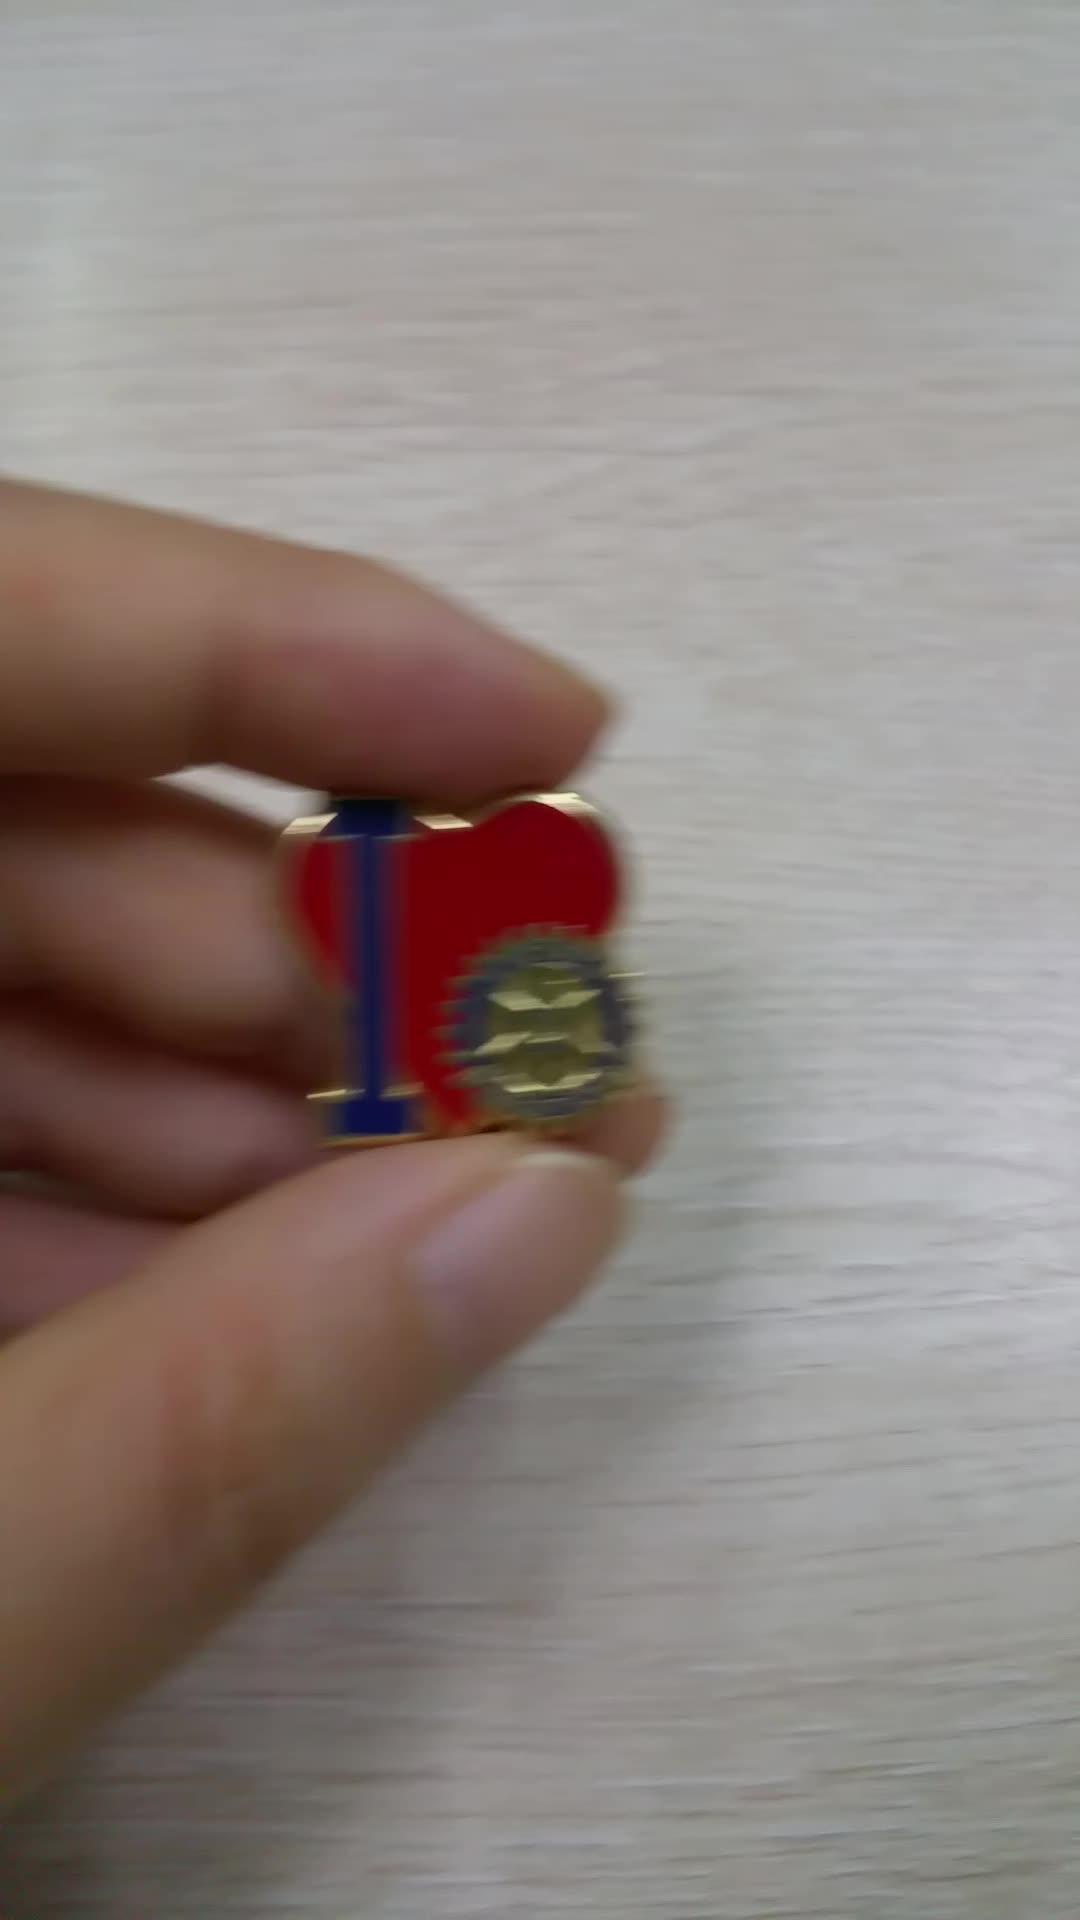 heart shaped pin badges, jewelry clasp locking pin back, lapel pin soft enamel